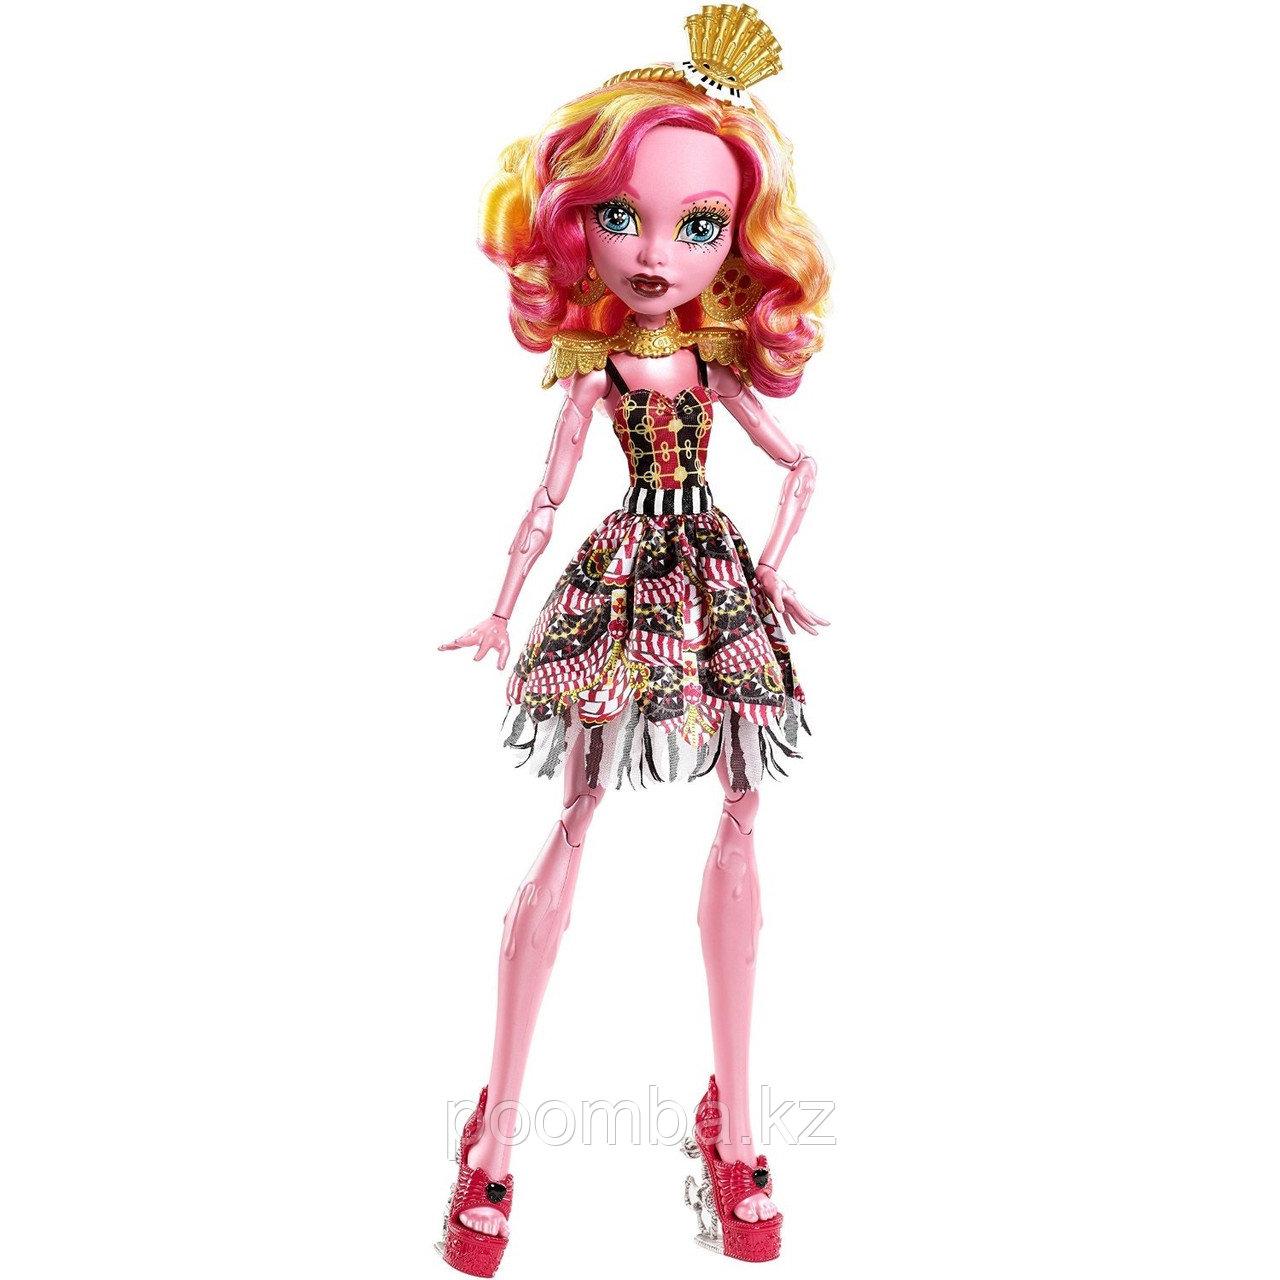 Кукла Монстр Хай Гулиоп Джеллингтон, Monster High Freak du Chic - Gooliope Jellington